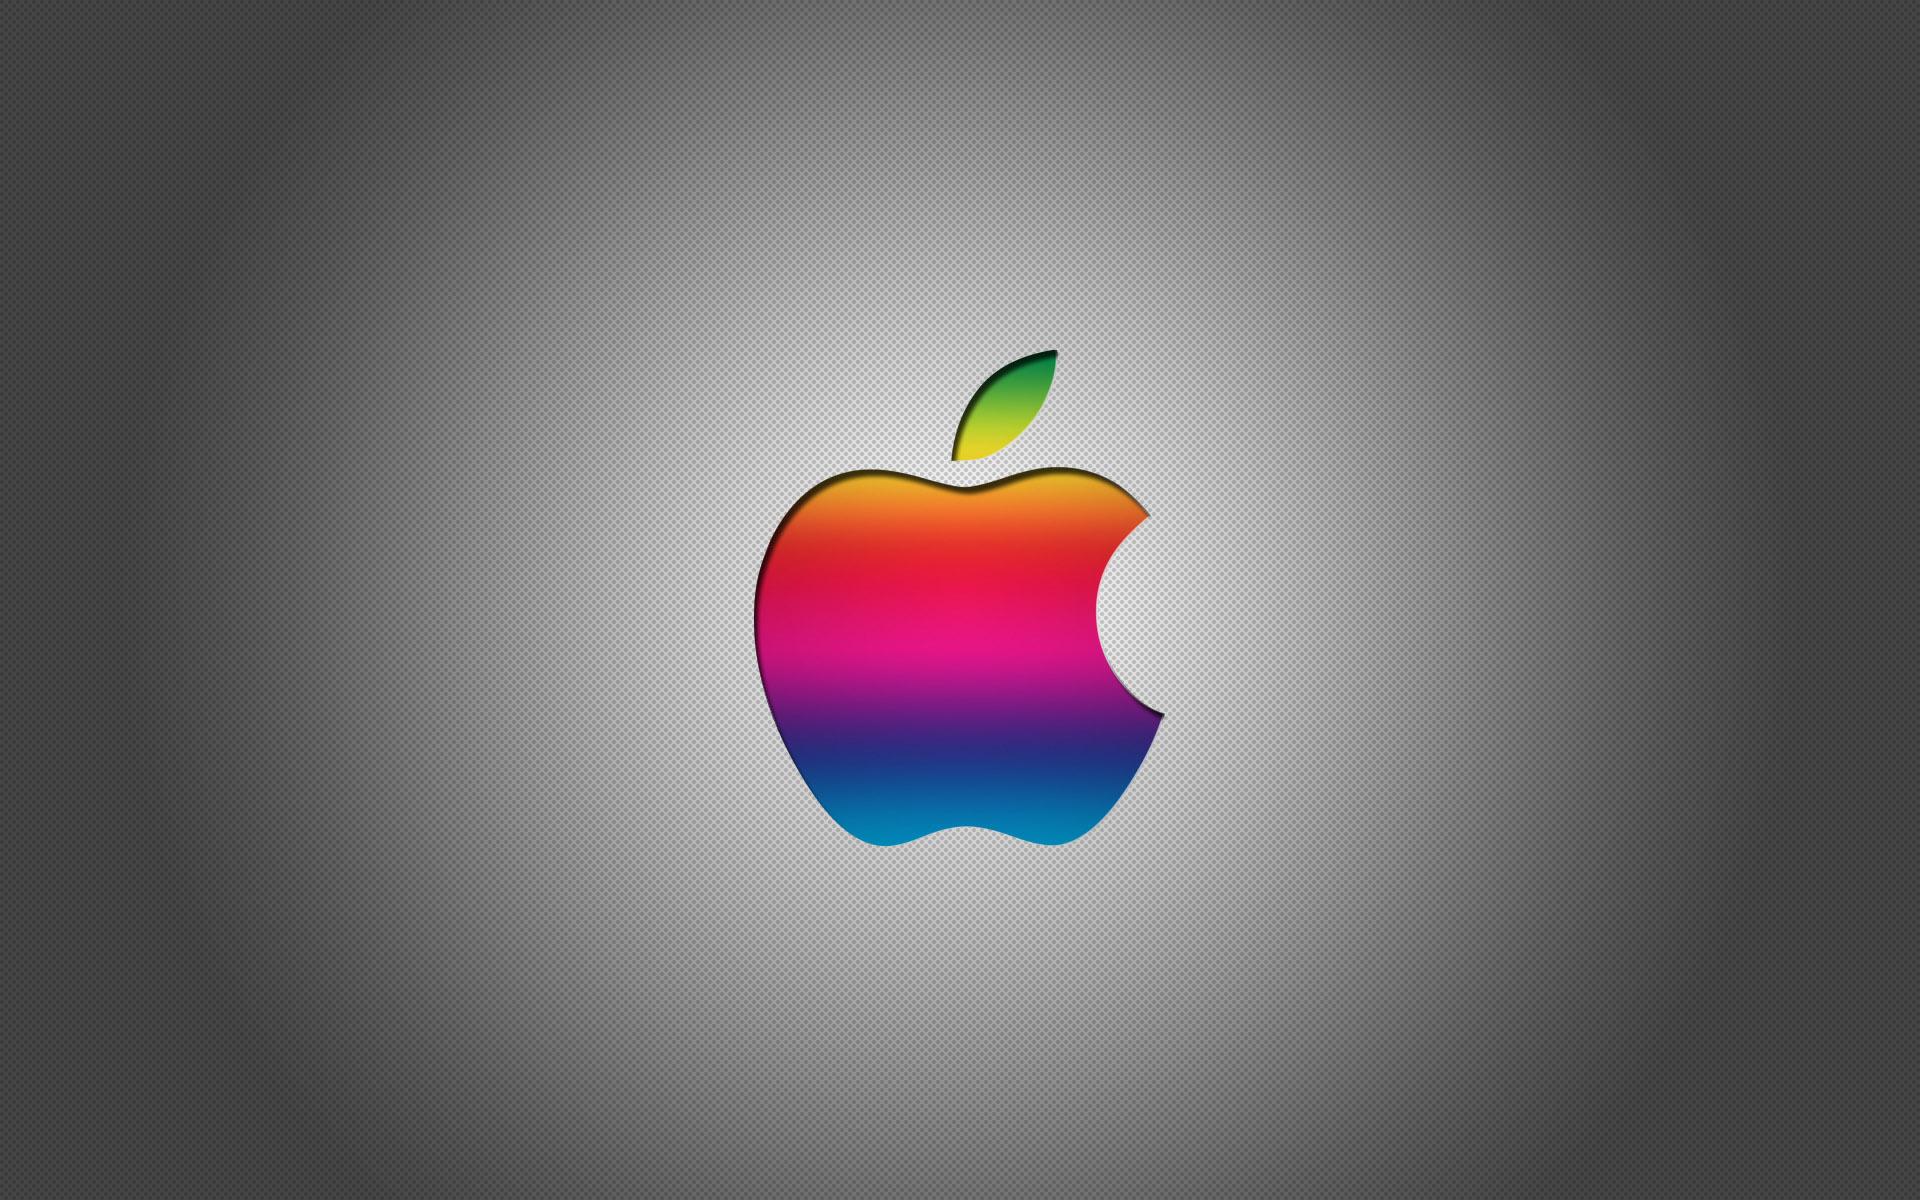 Colorful Apple Logo With Grey Background HD Wallpaper Desktop Mac